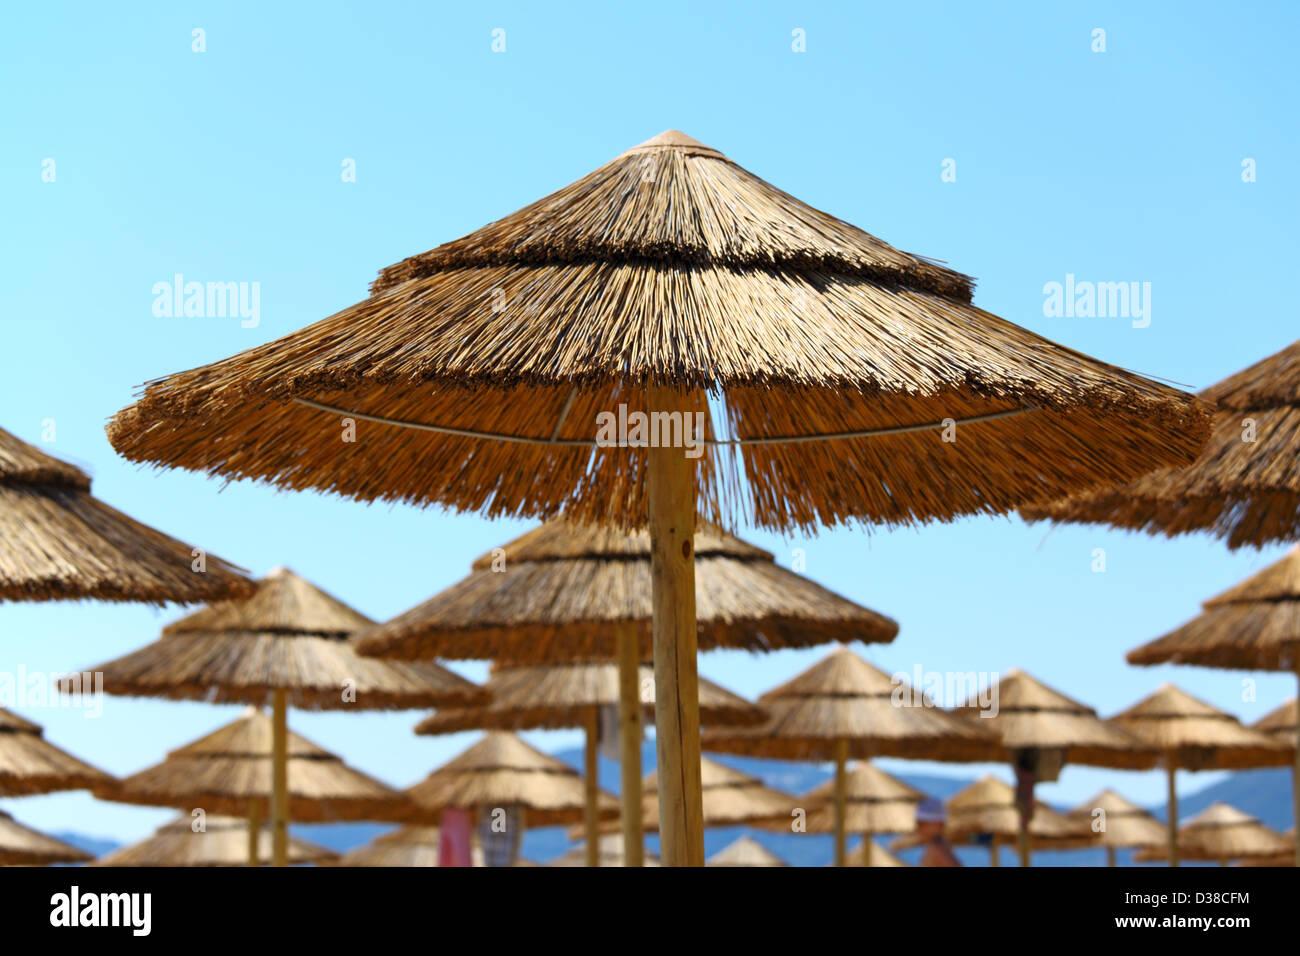 Stroh Sonnenschirme am Strand. Korfu, Griechenland Stockbild